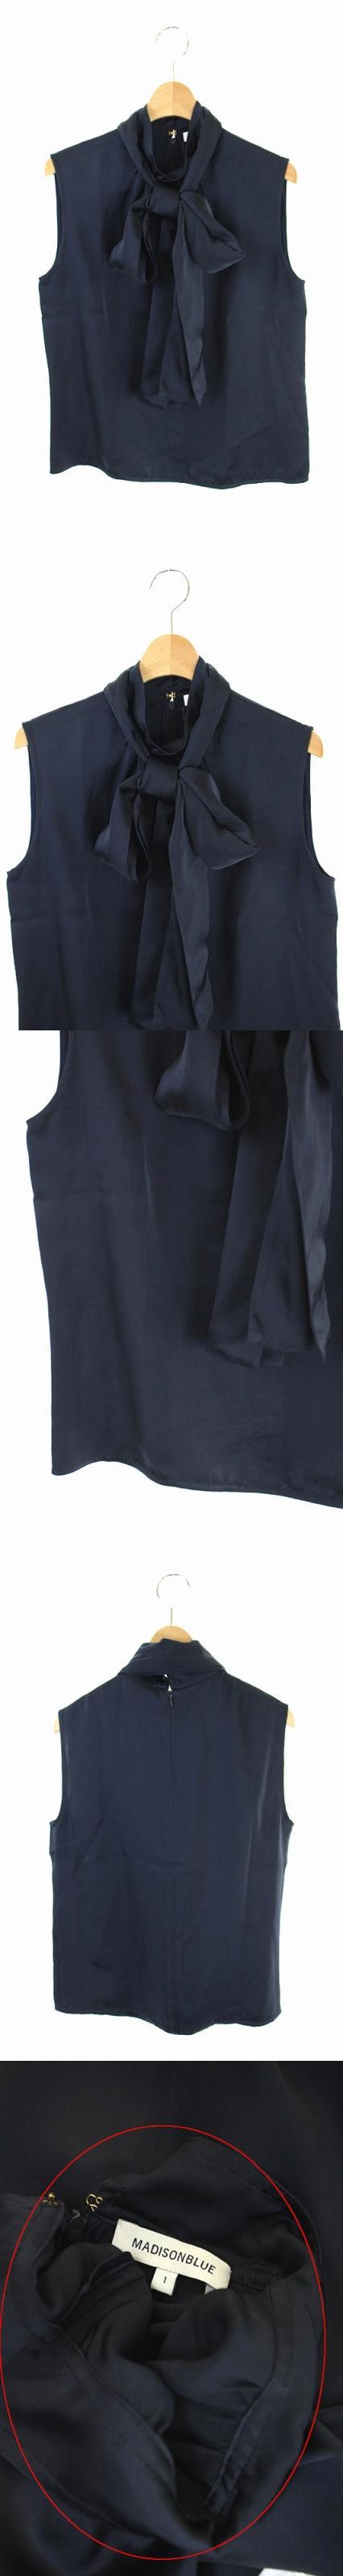 18SS ブラウス ノースリーブ プルオーバー ハイネック リボン付き 1 紺 /AA ■OS